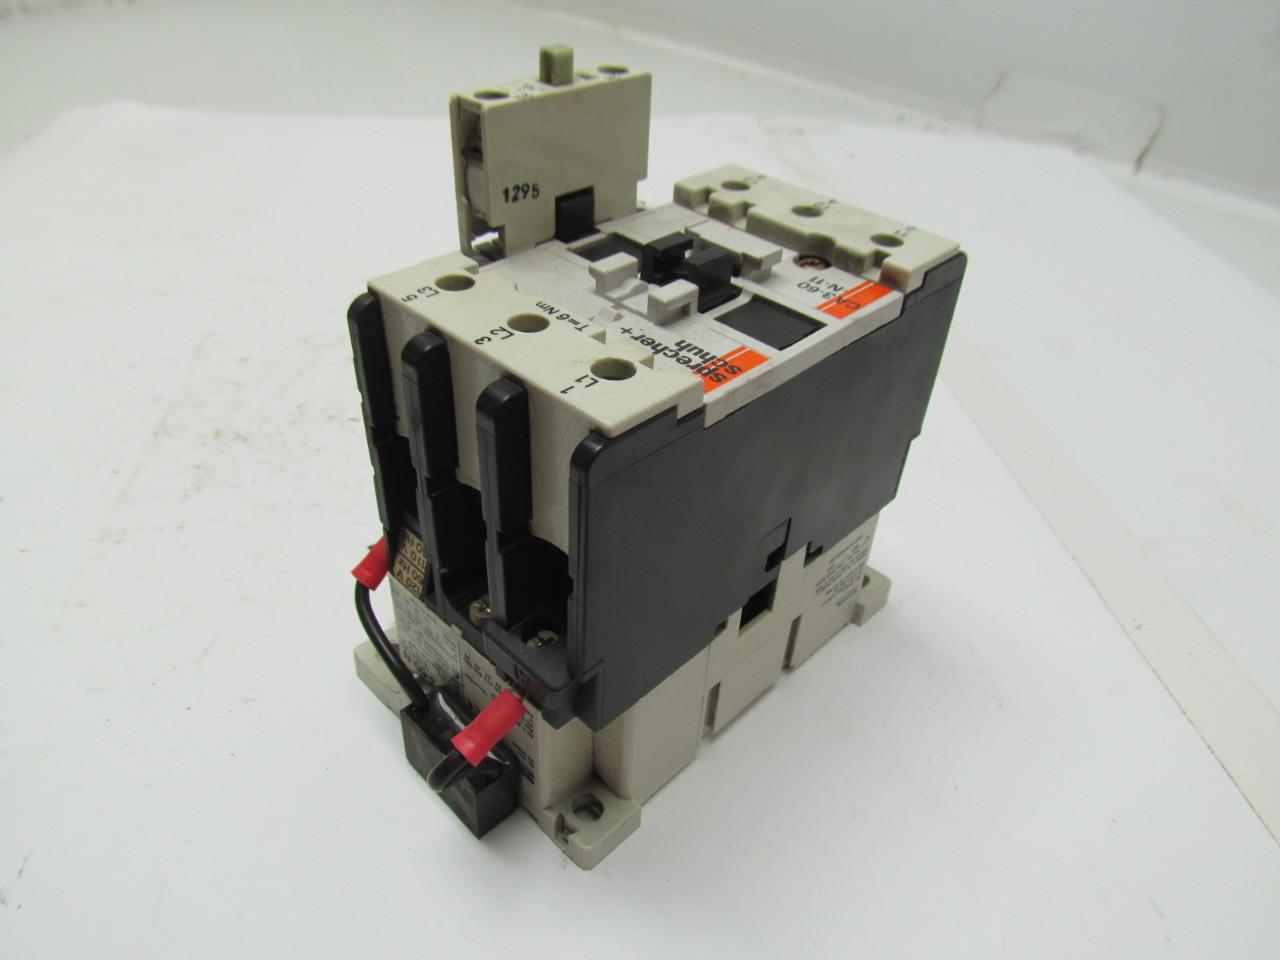 C14 Plug Wiring Diagram Iec Plug Wiring Diagram